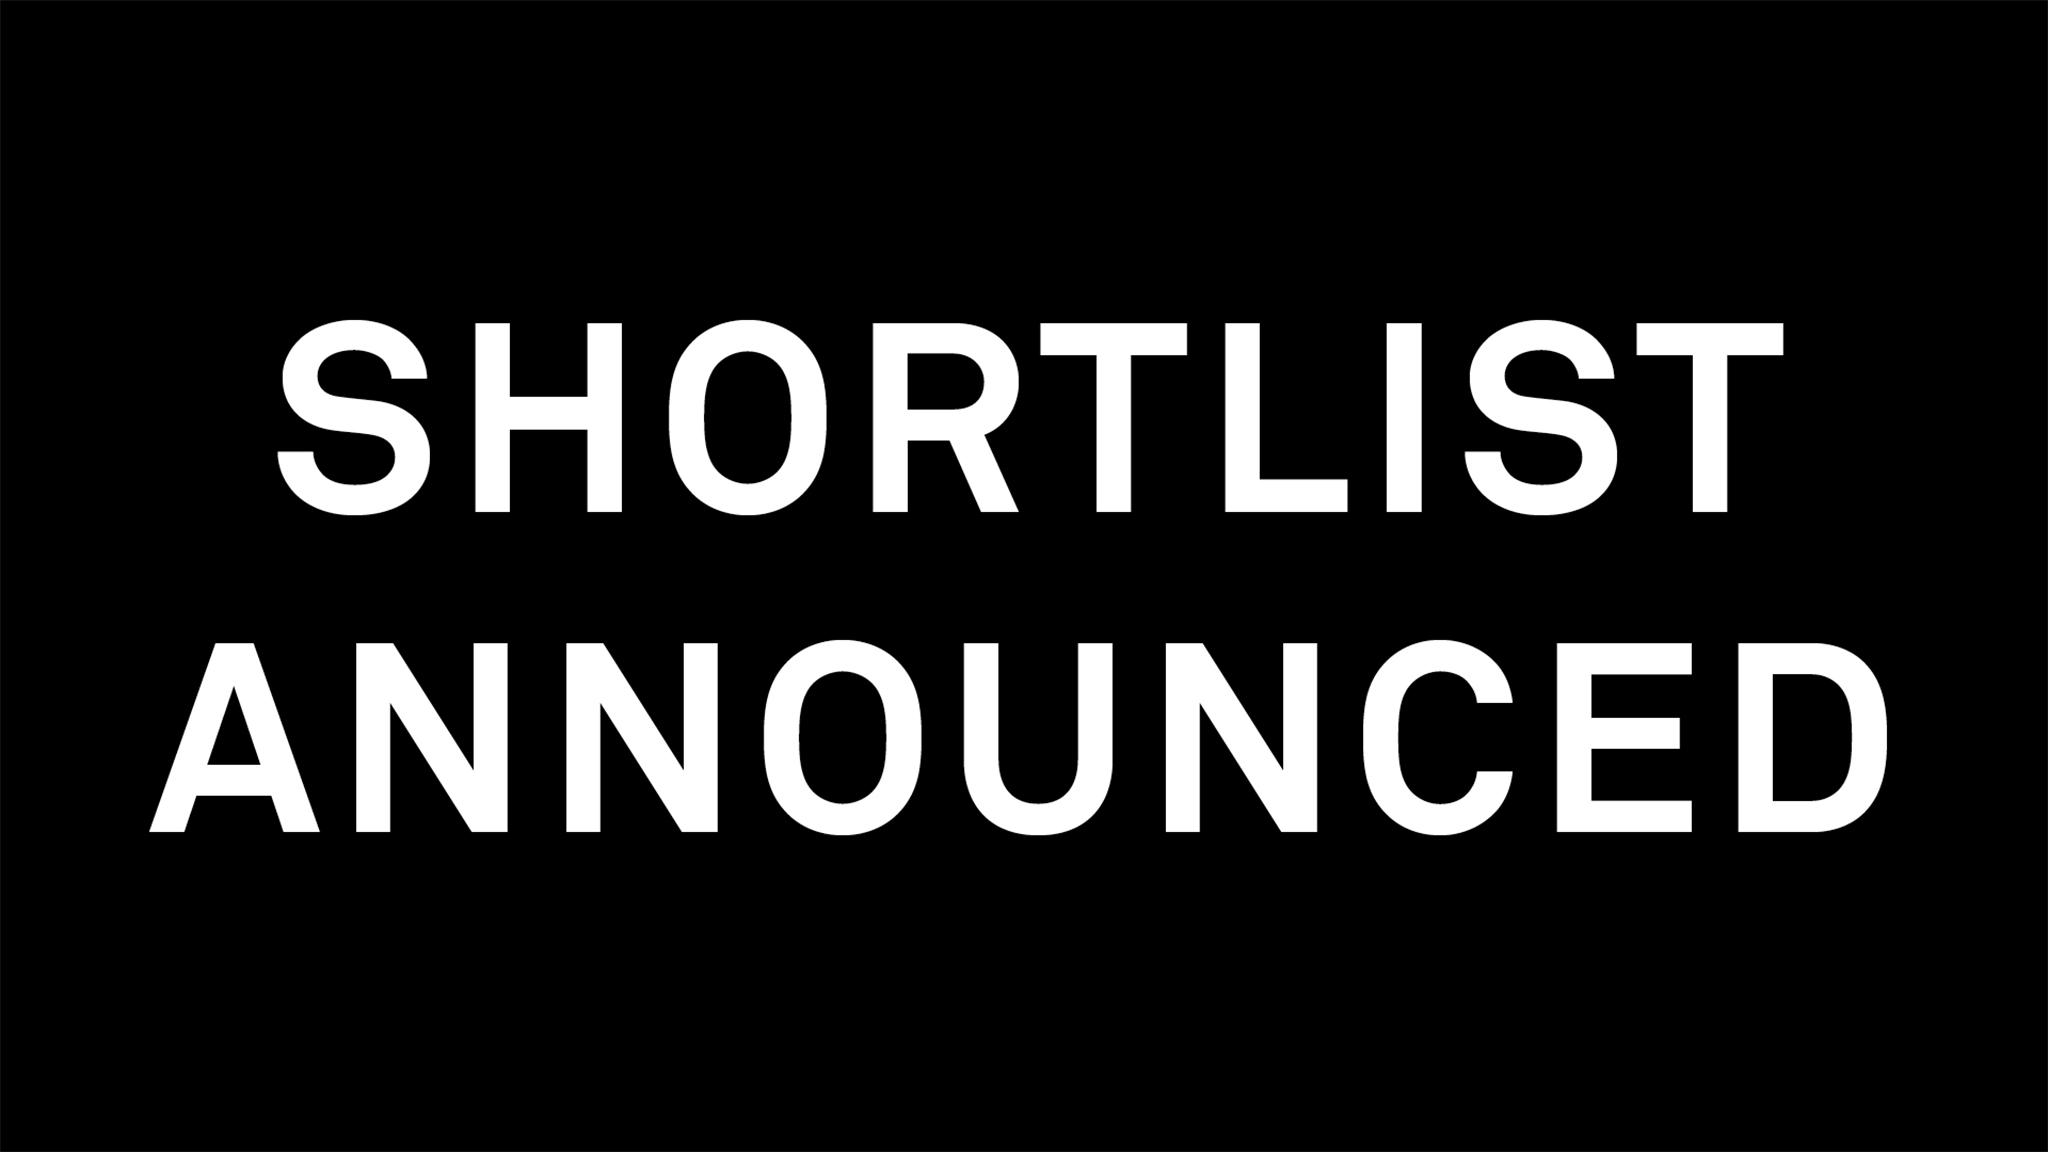 New London Awards 2021 Shortlist Announced